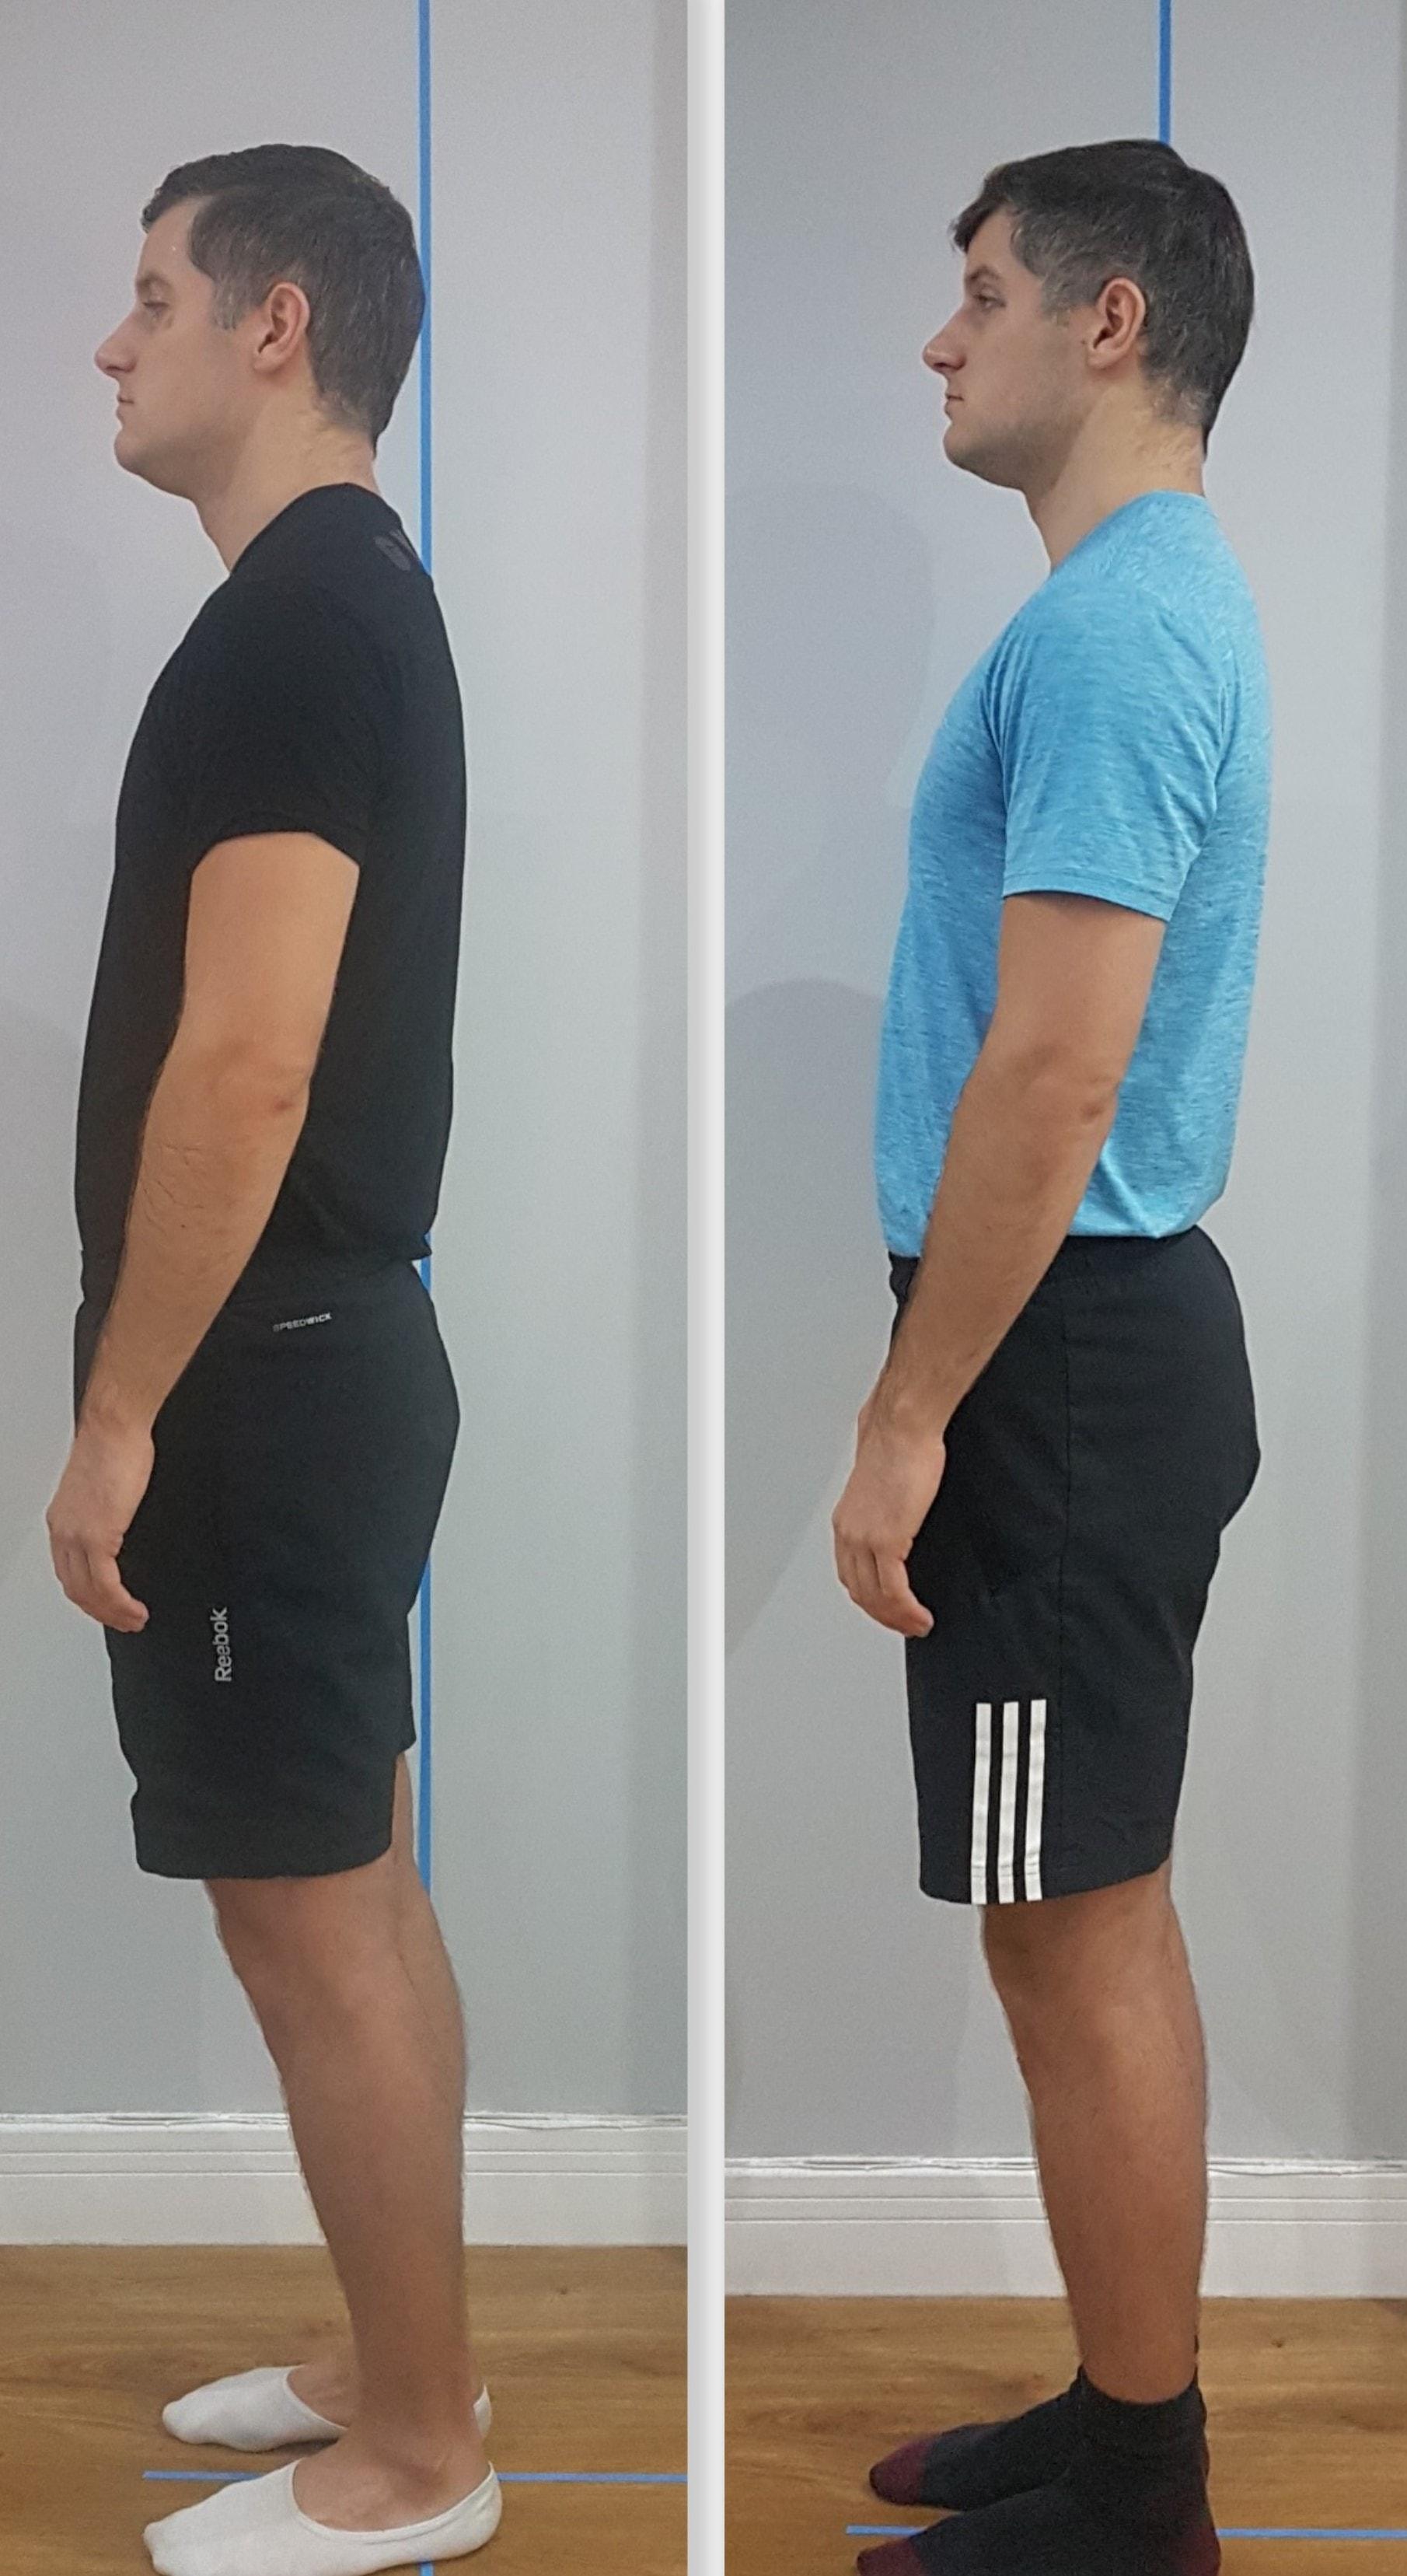 Posture Correction